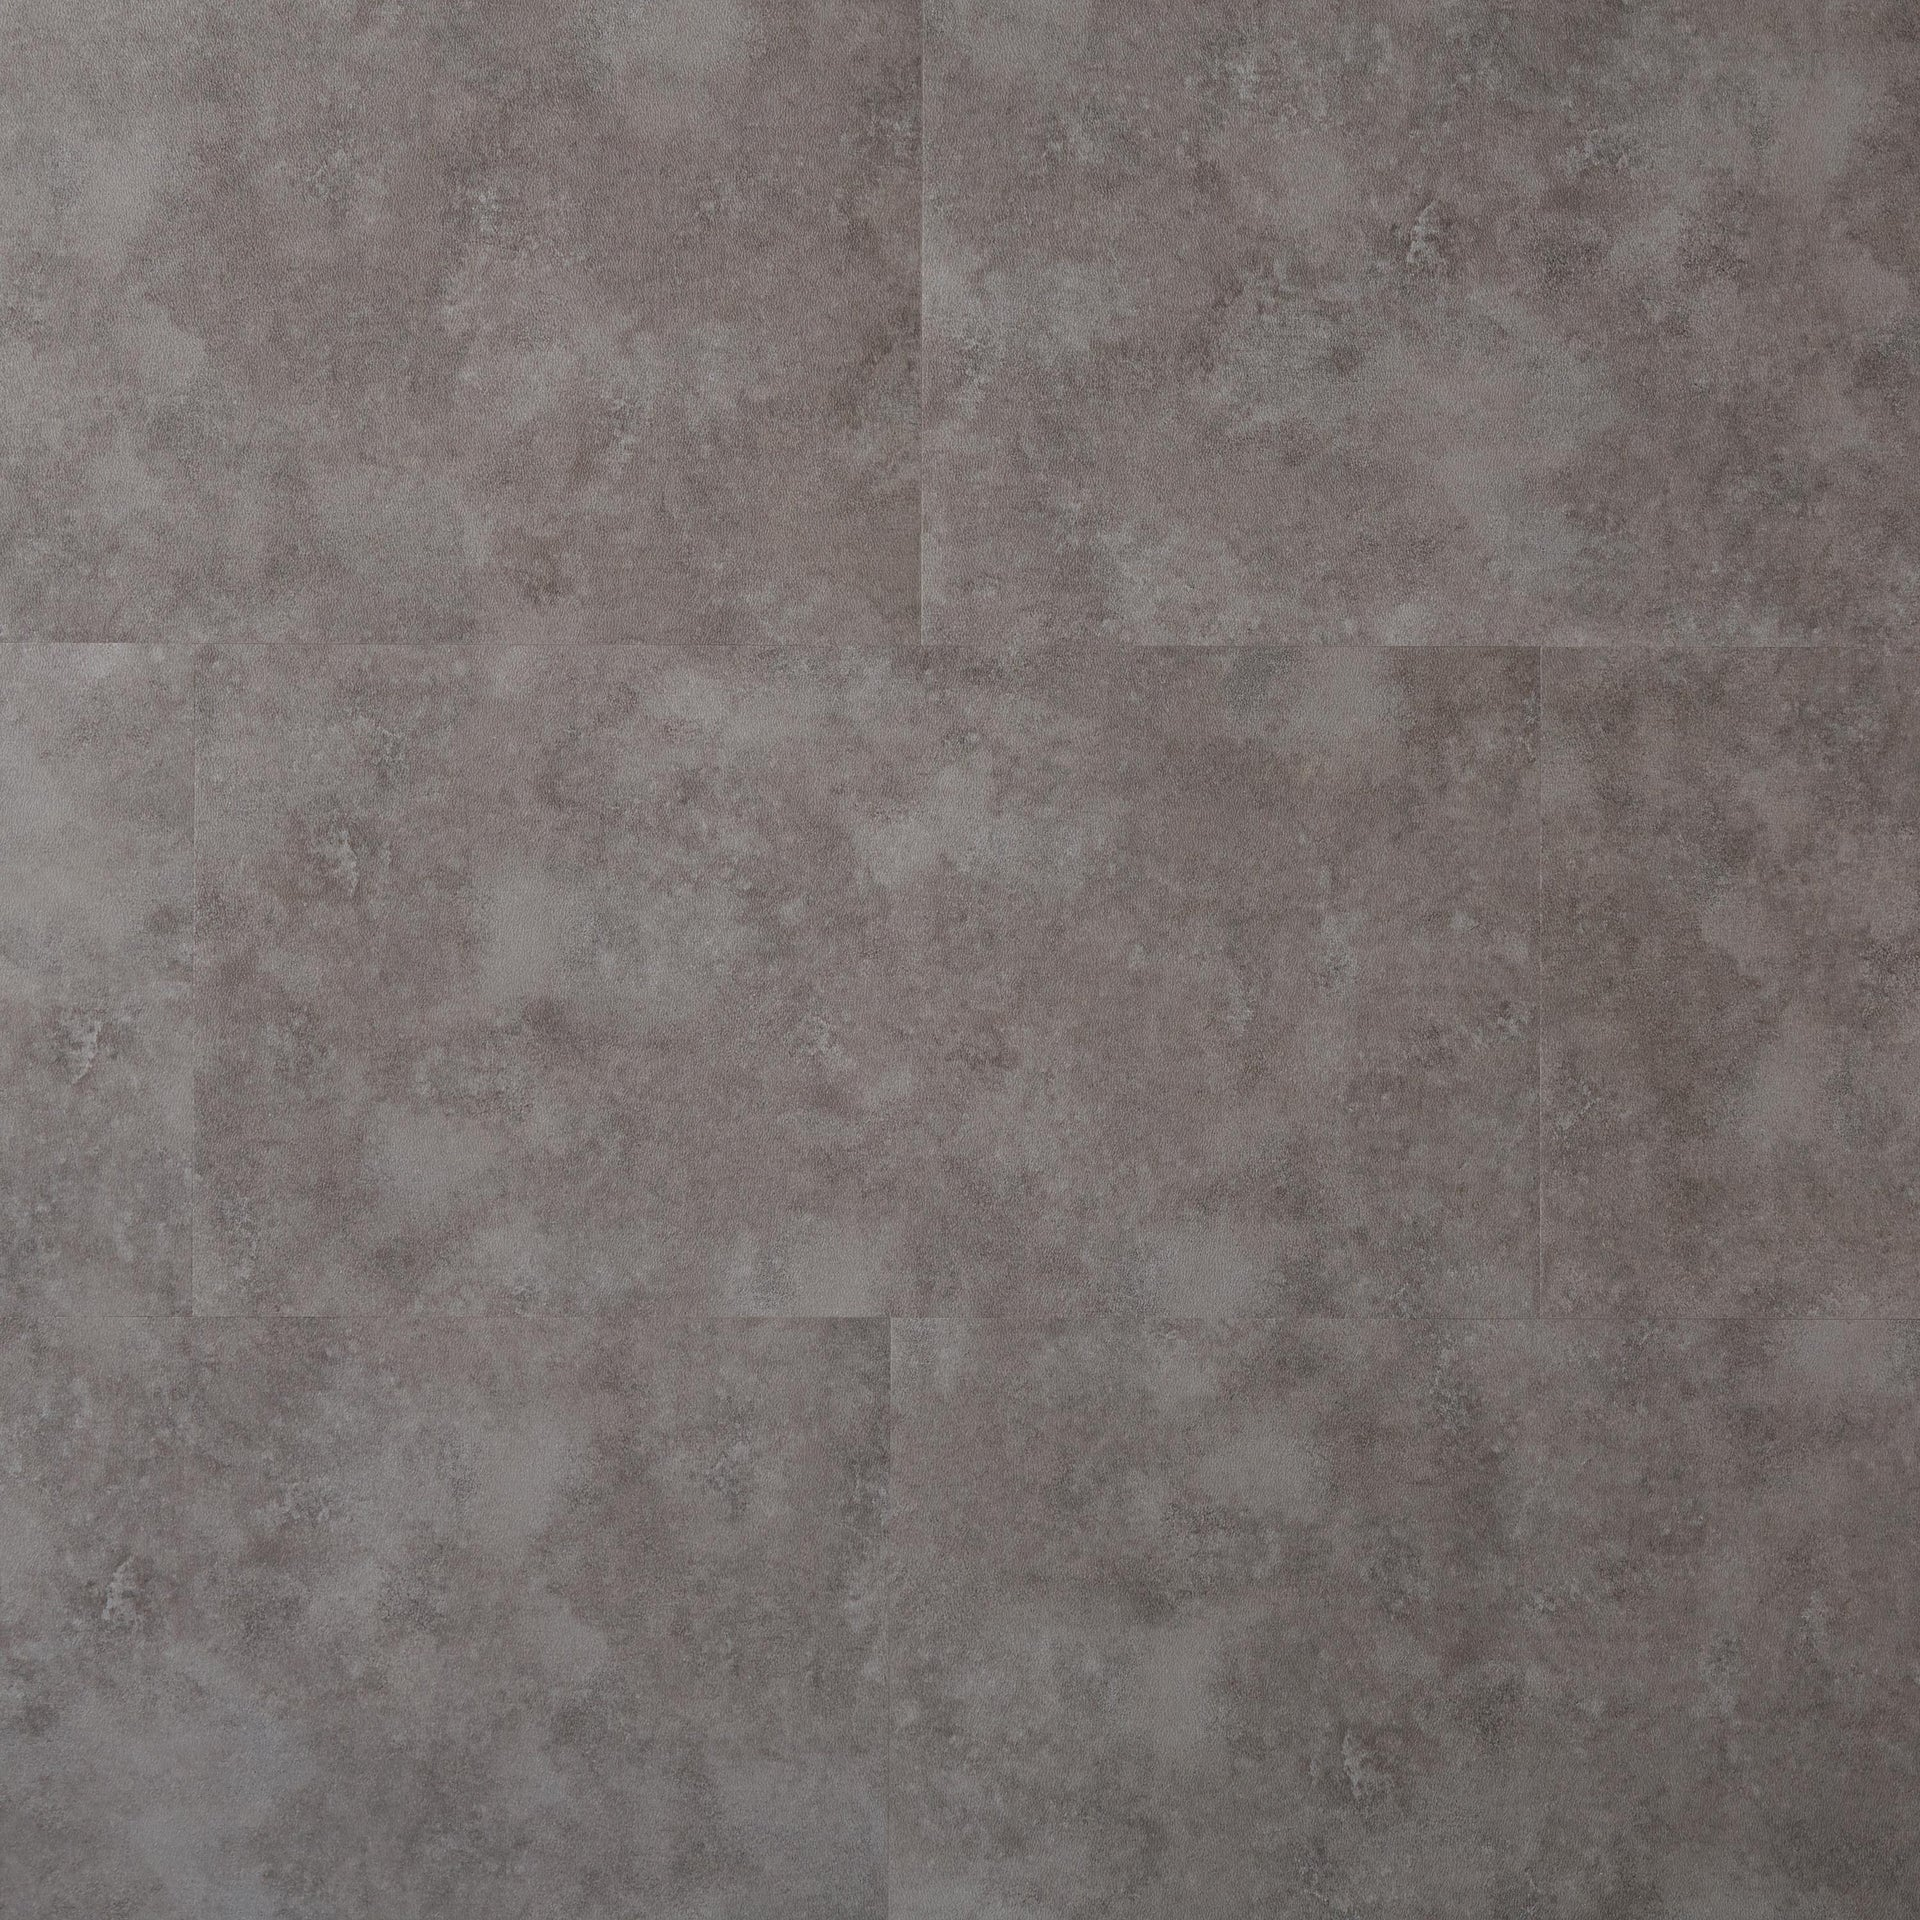 Pavimento PVC adesivo Dark Sp 1.5 mm grigio / argento - 2